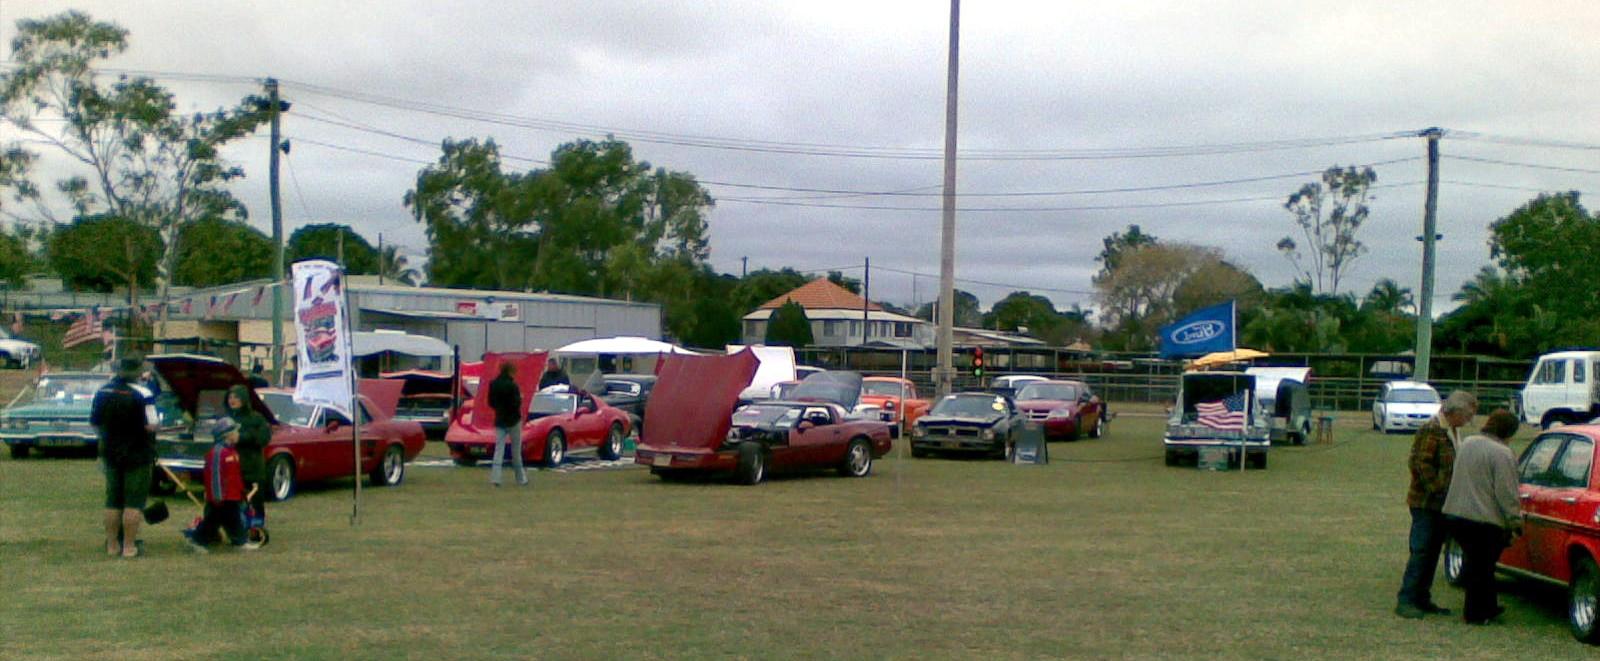 Club display set up 12062011(008)